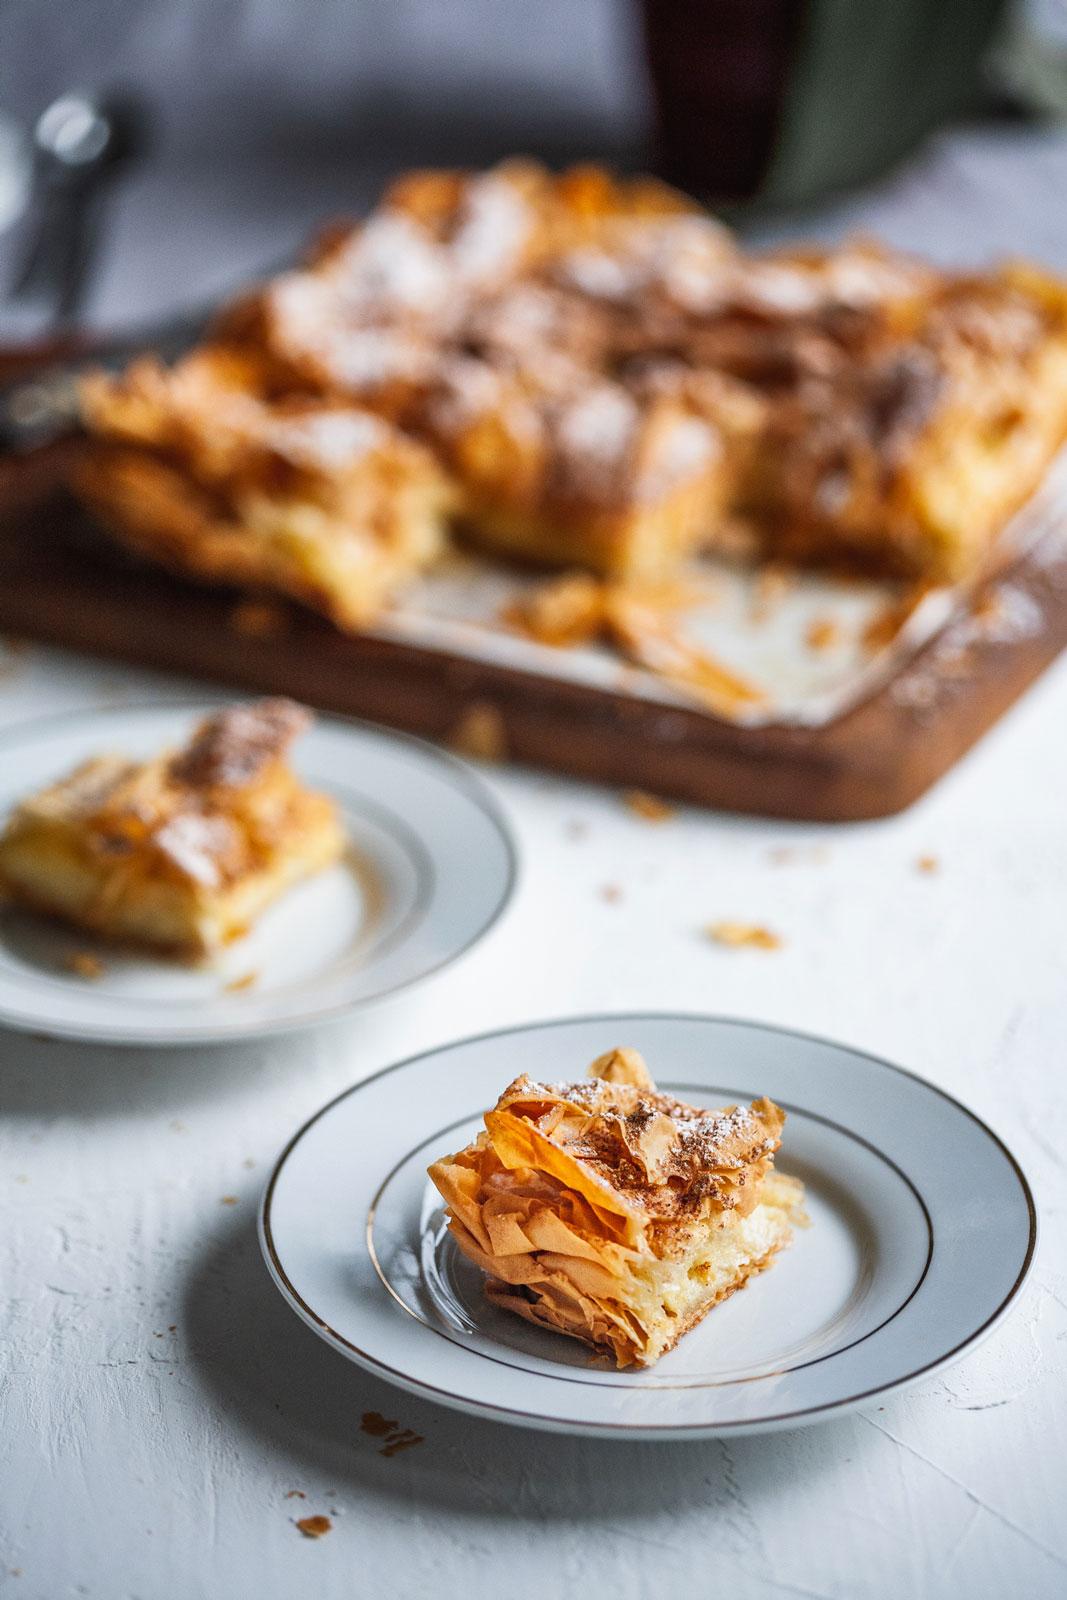 Greek-Style Custard Pastry